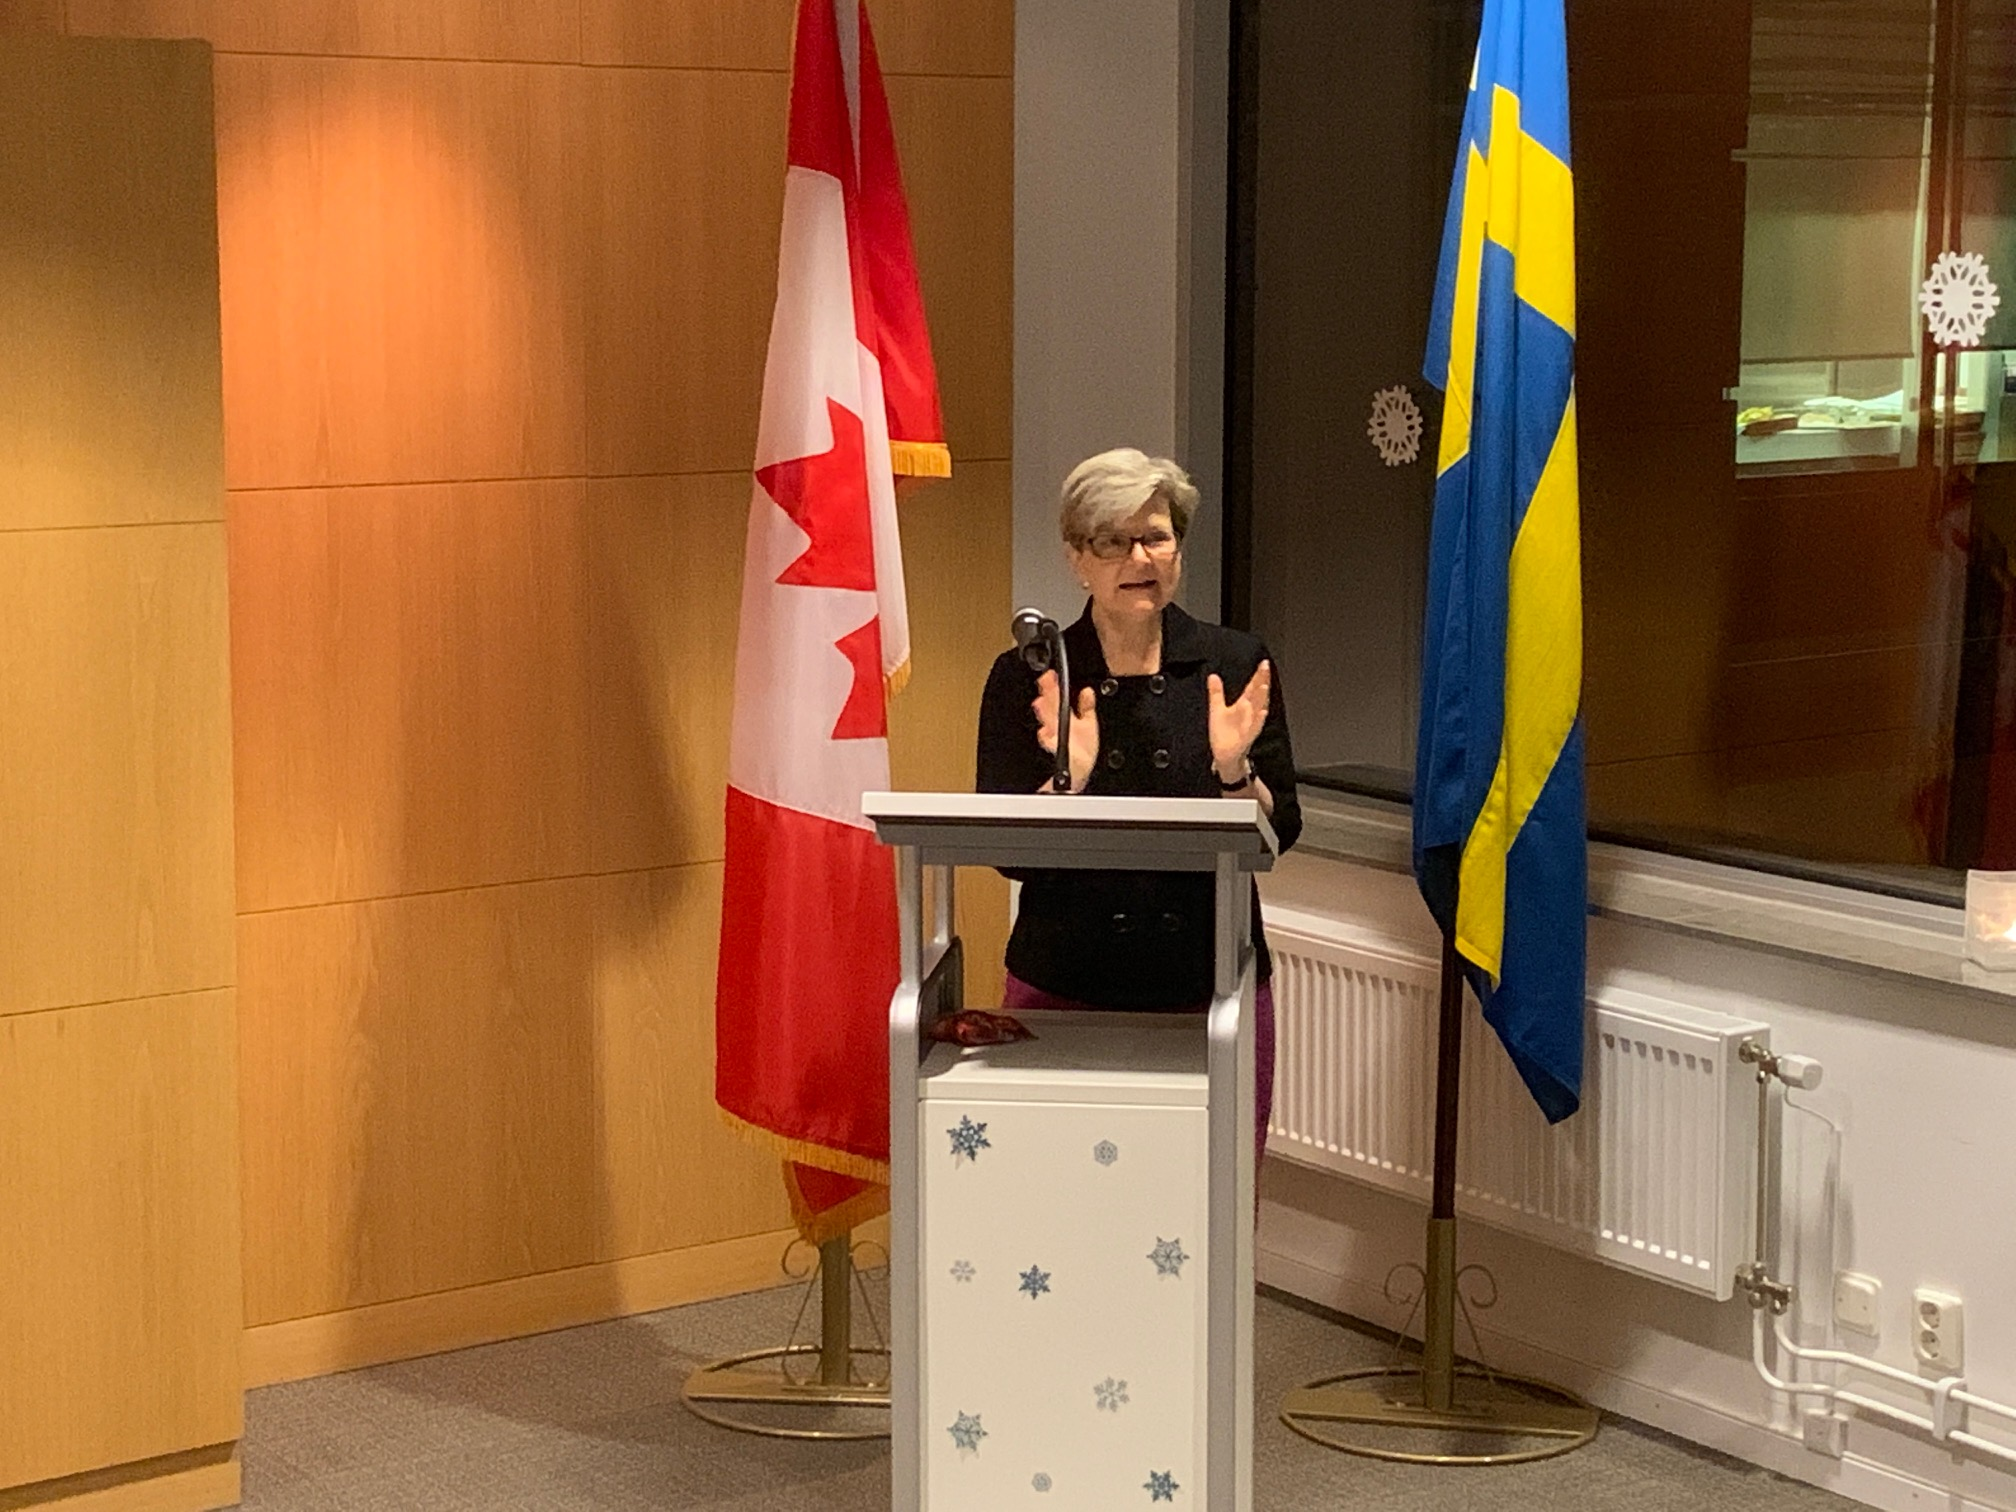 Kanadensiska ambassadören Heather Grant